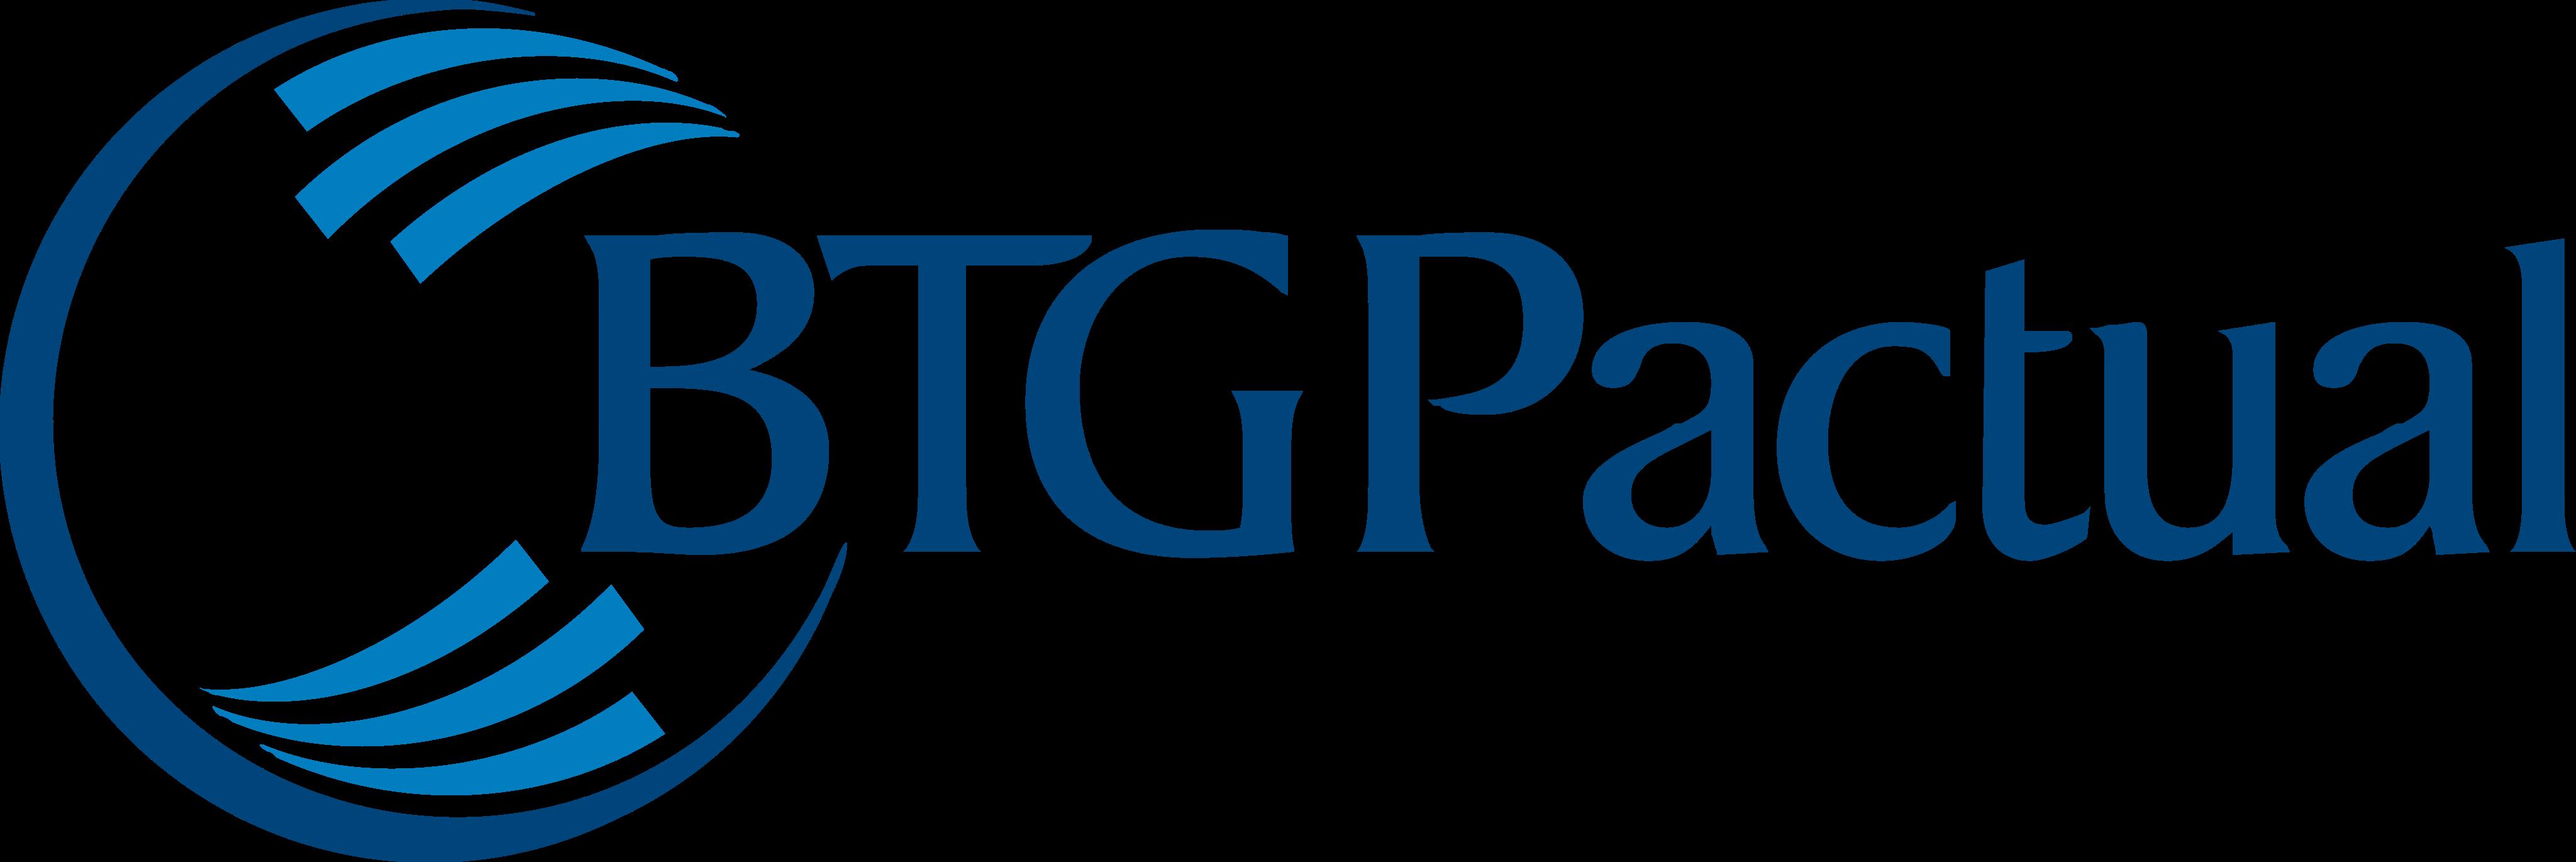 btg pactual logo 1 - BTG Pactual Logo